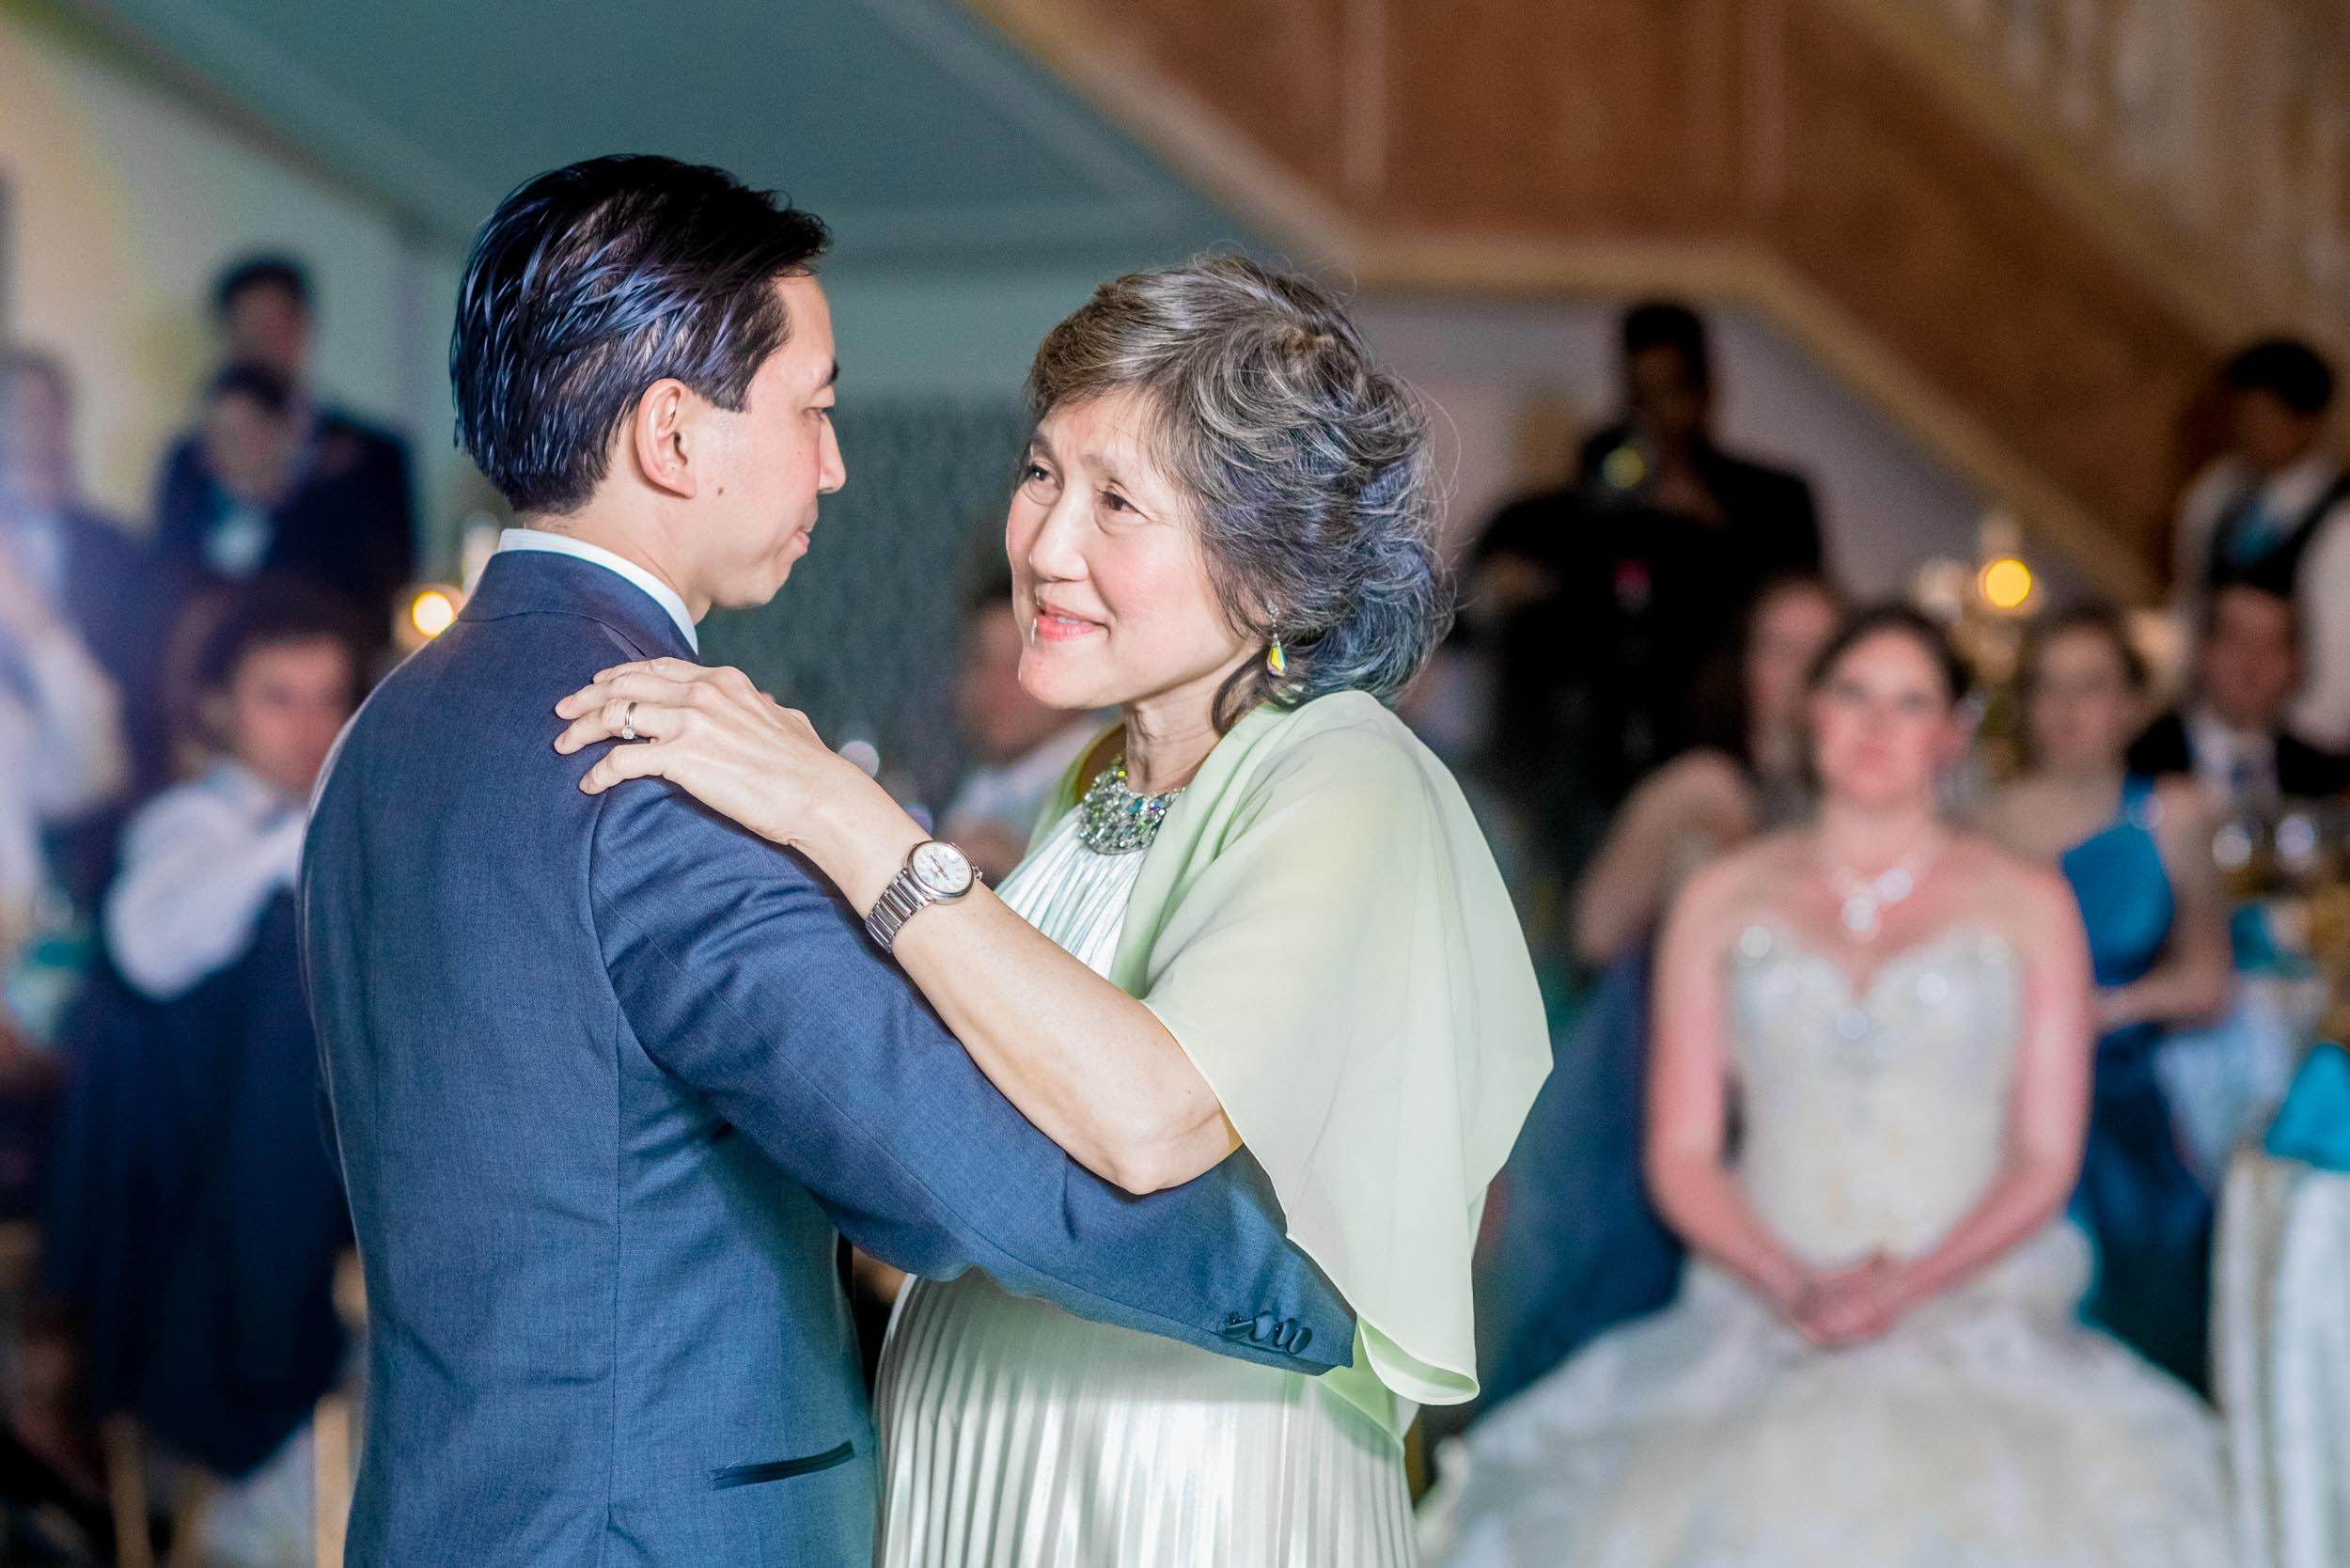 dc+metro+wedding+photographer+vadym+guliuk+photography+wedding+parent+dances-2026.jpg